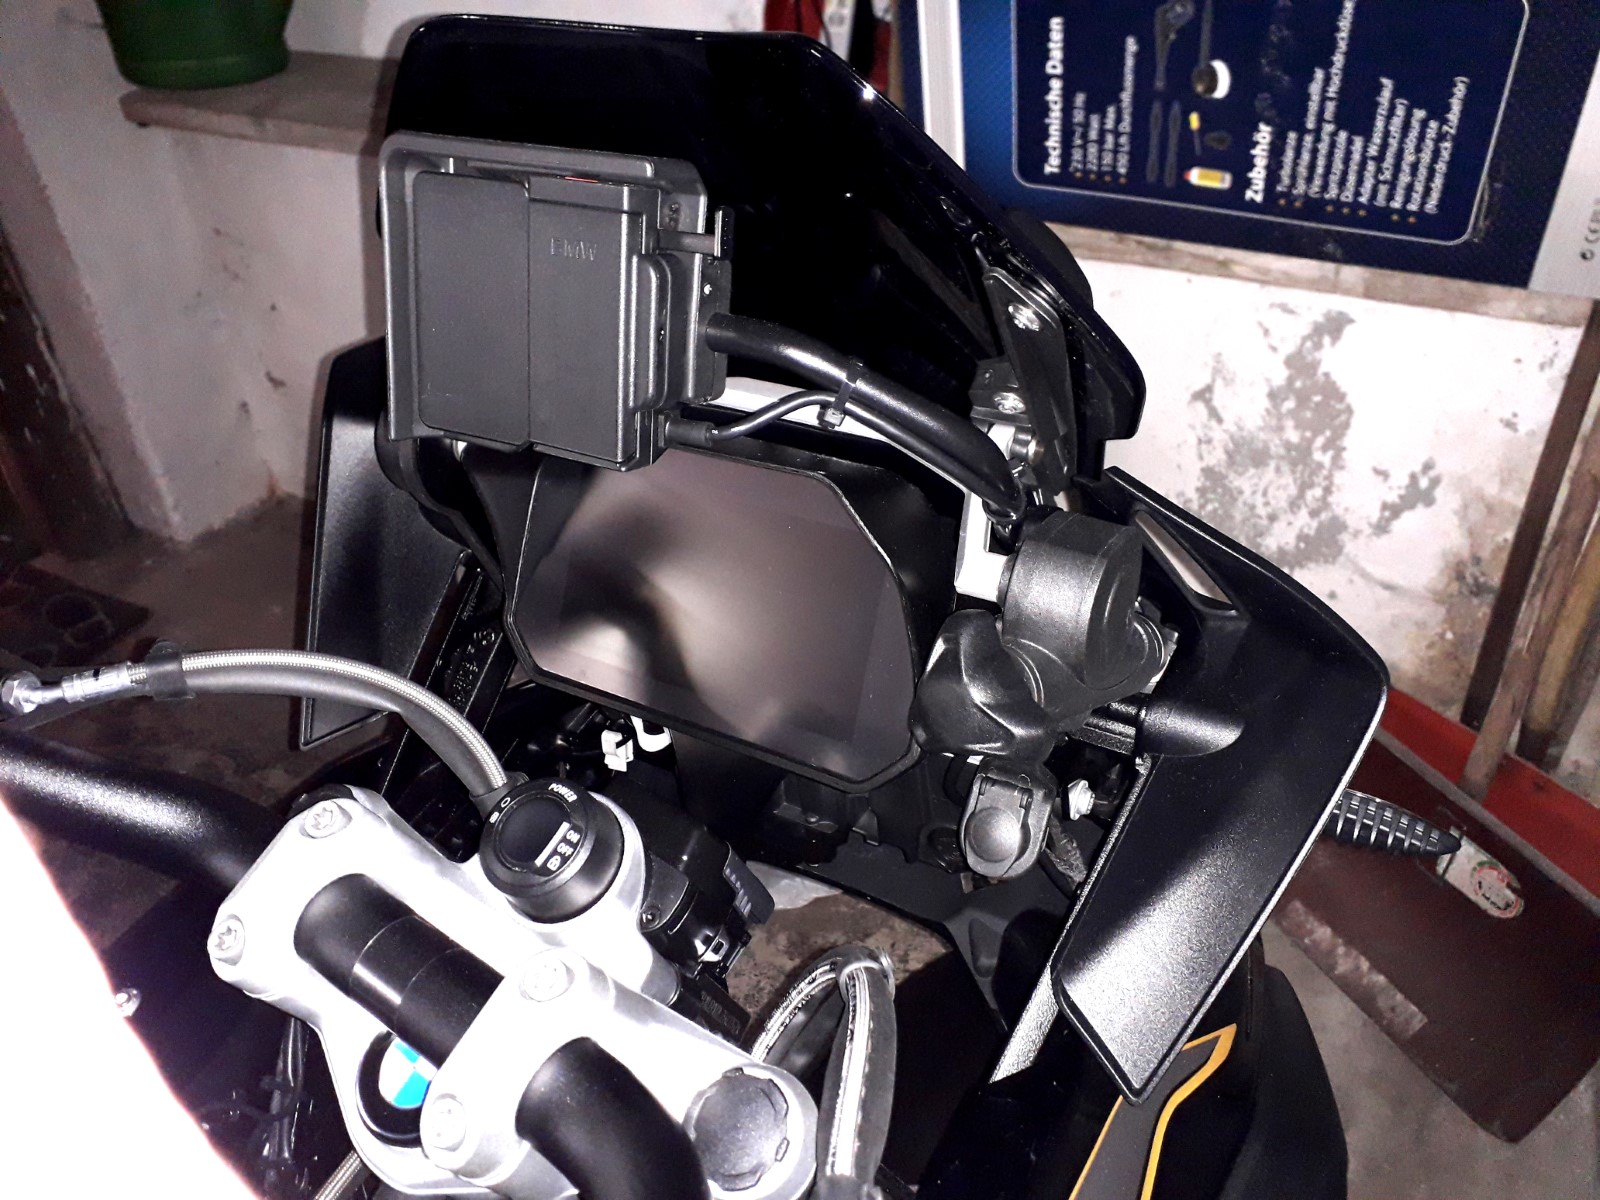 Cockpit-Blende (1).jpg